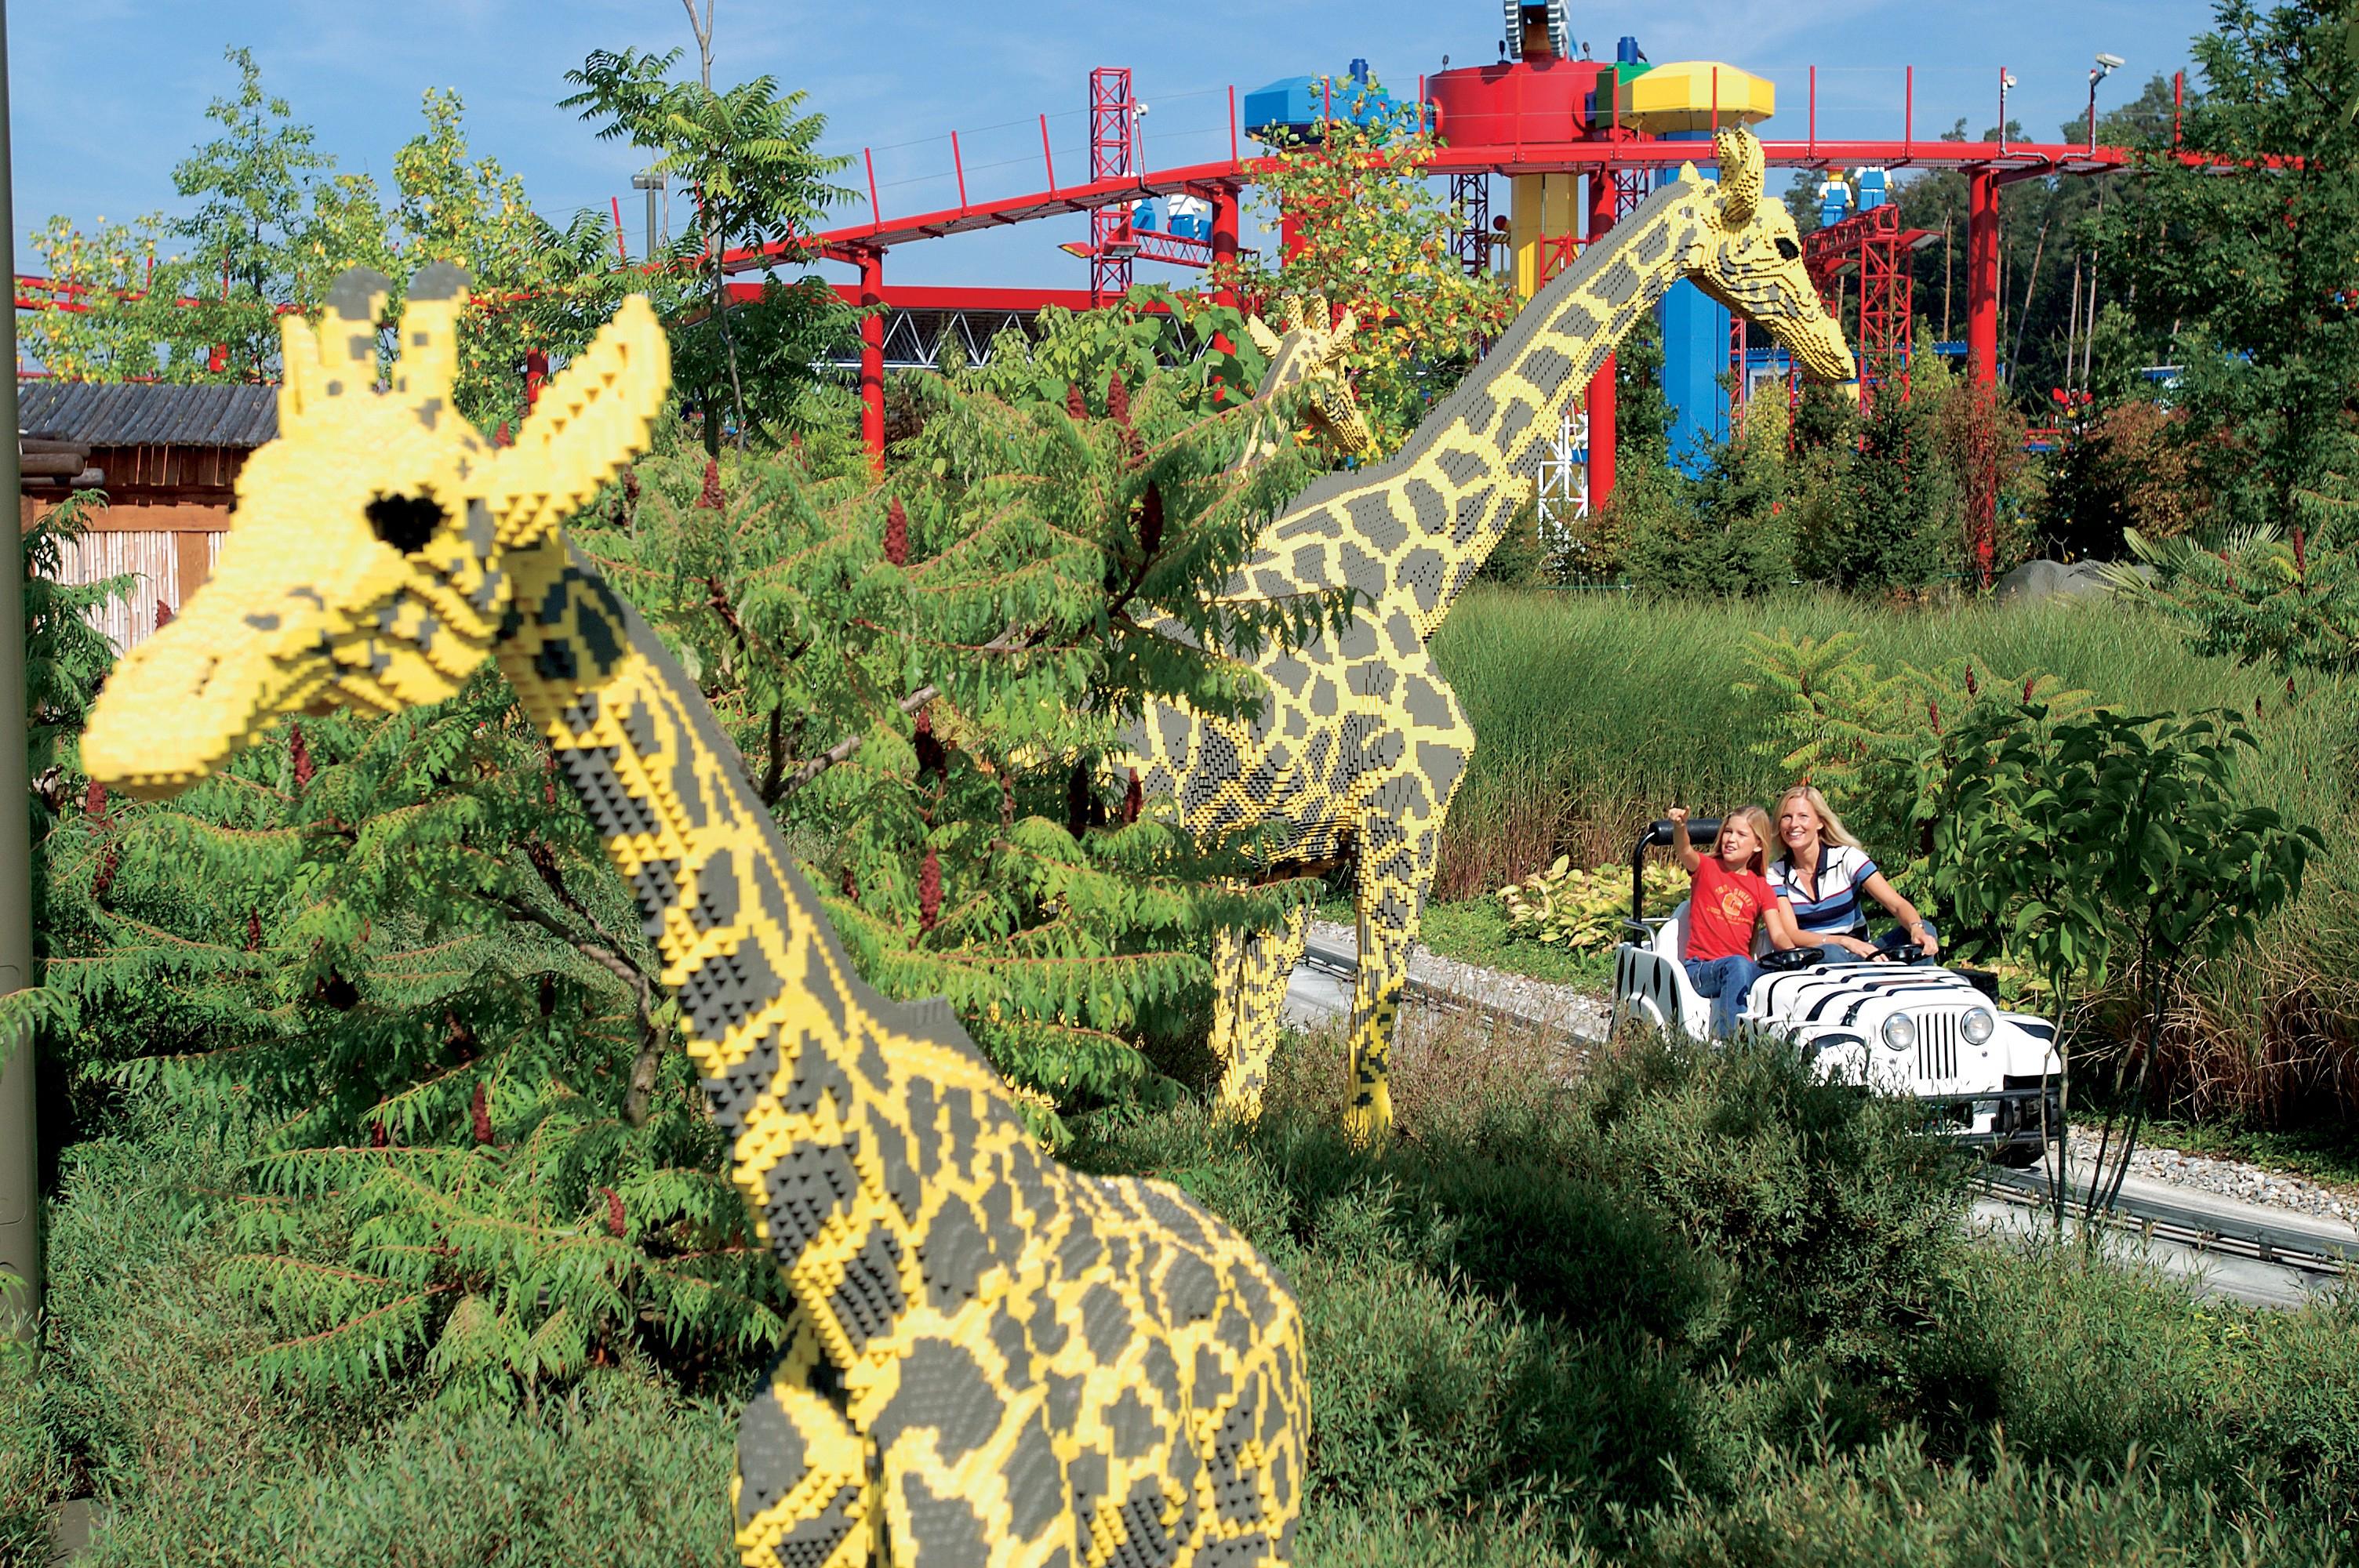 safari-tour-im-legoland-deutschland-2